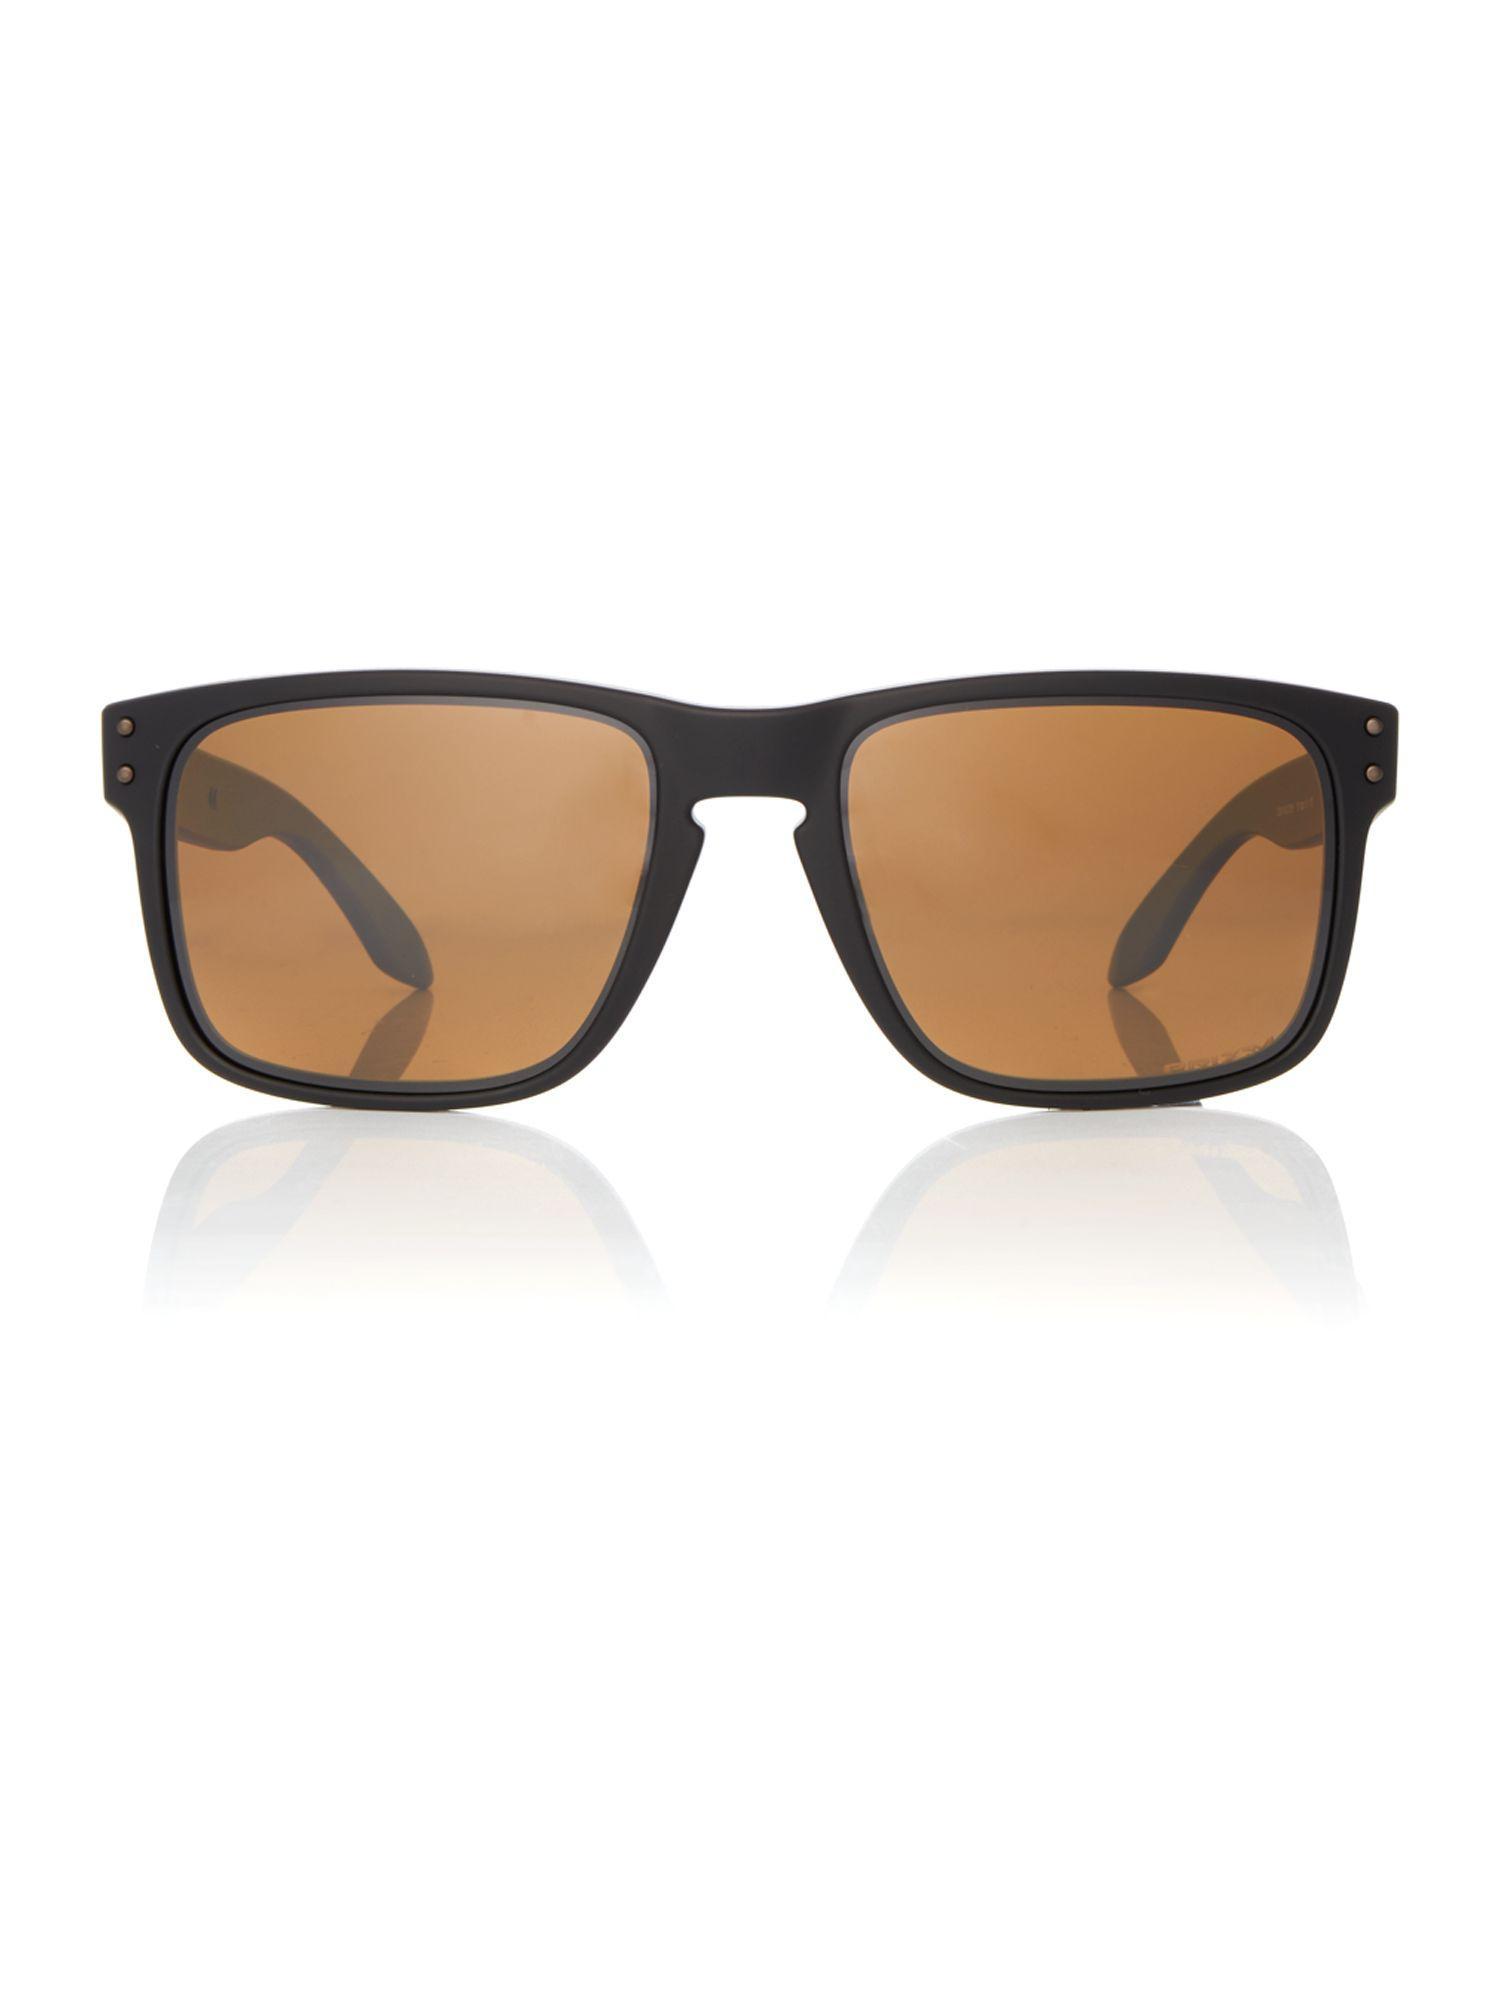 Oakley Black Oo9102 Holbrook Square Sunglasses for Men